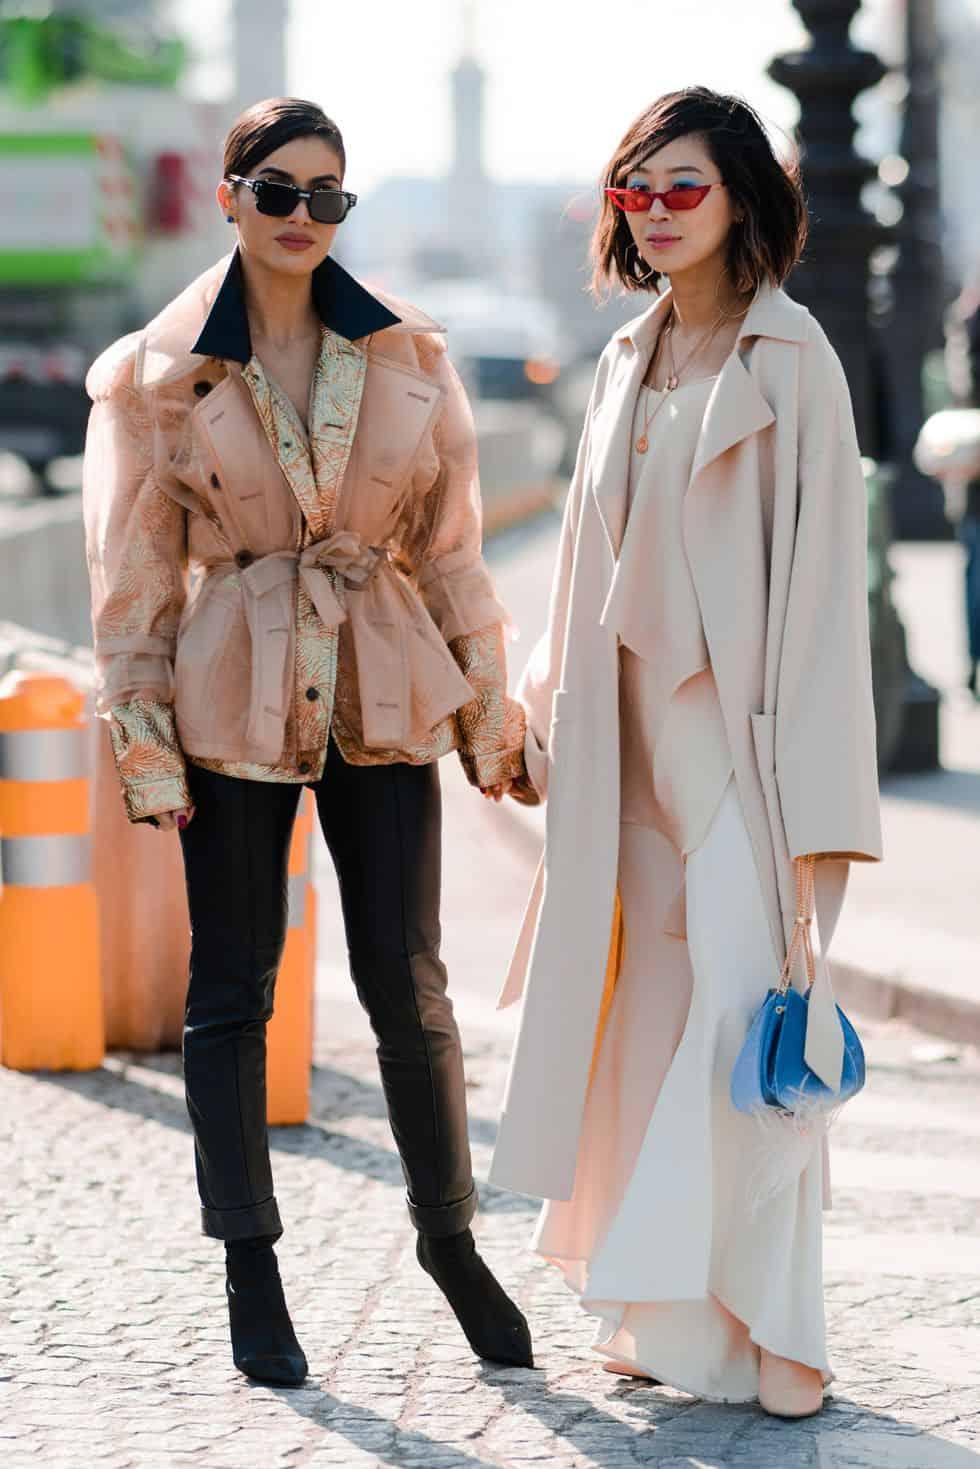 fashion-week-street-style-fall-2018-5-1.jpg